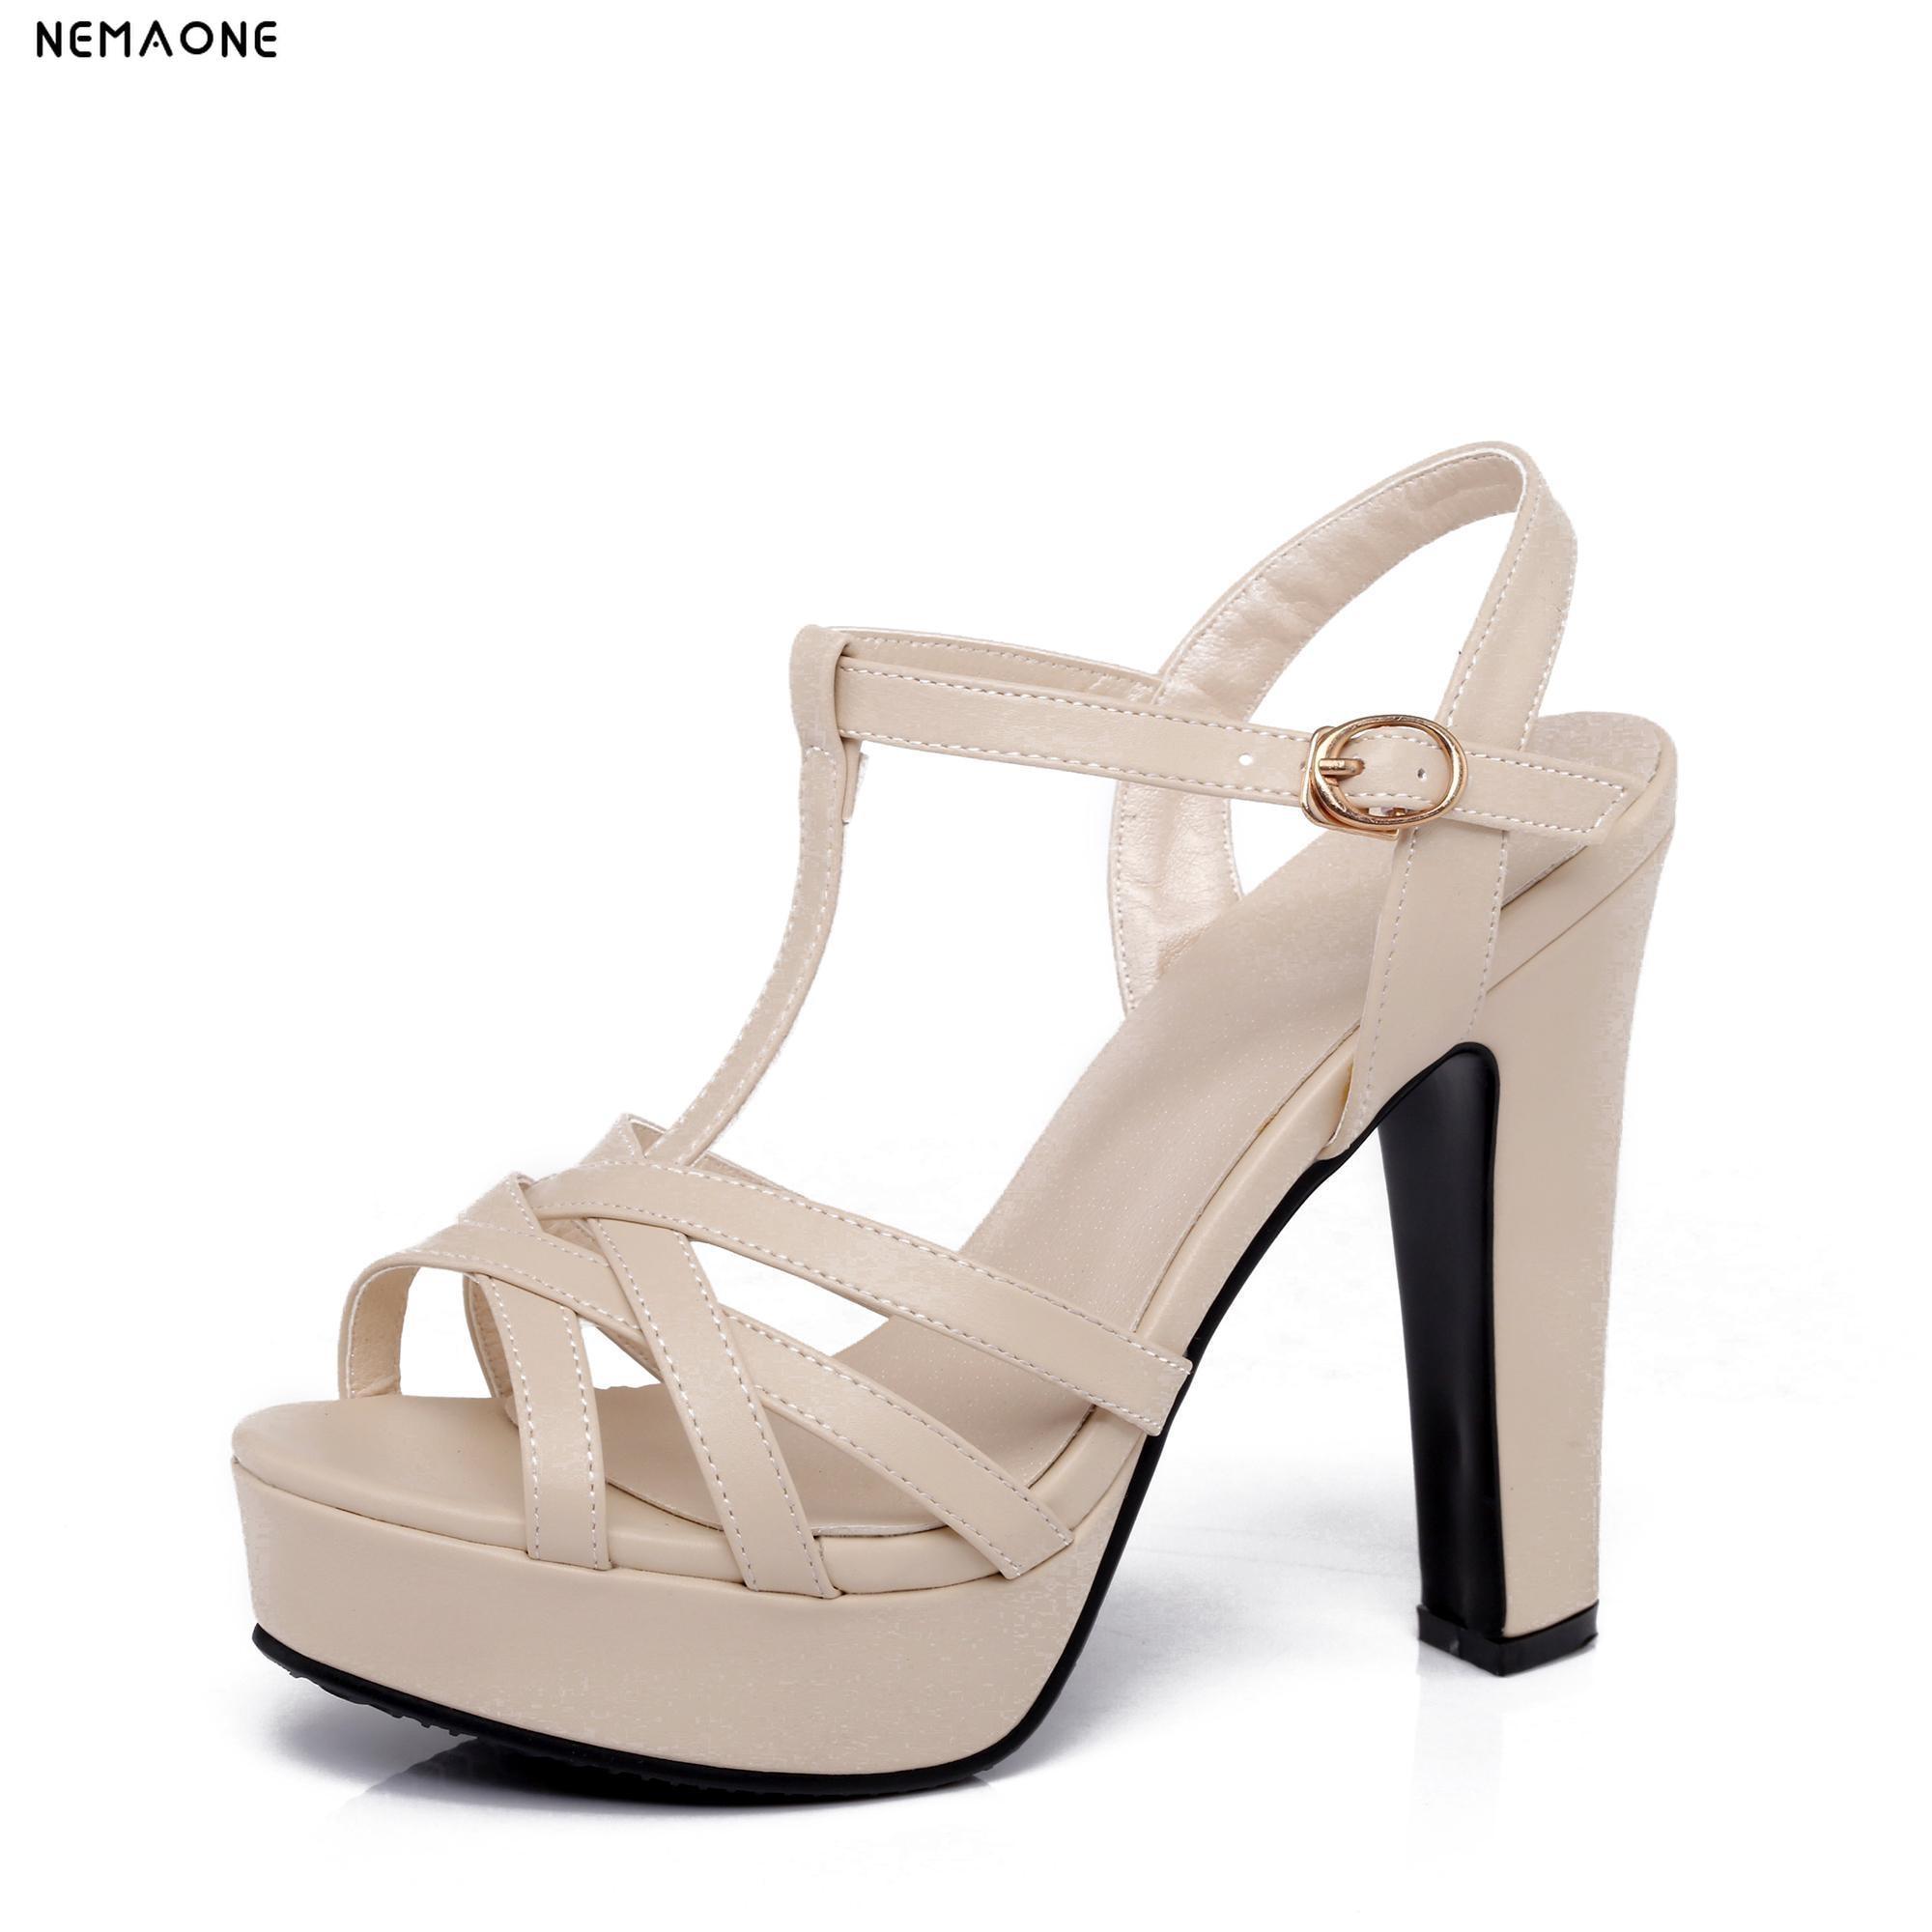 NEMAONE Women High heels Sandals 2017 New Arrivals Fashion Thick High Heels Sandal For Women Sexy Open Toe Summer Dress Shoes 2018 fashion women pumps sexy open toe heels sandals woman sandals thick with women shoes high heels s144